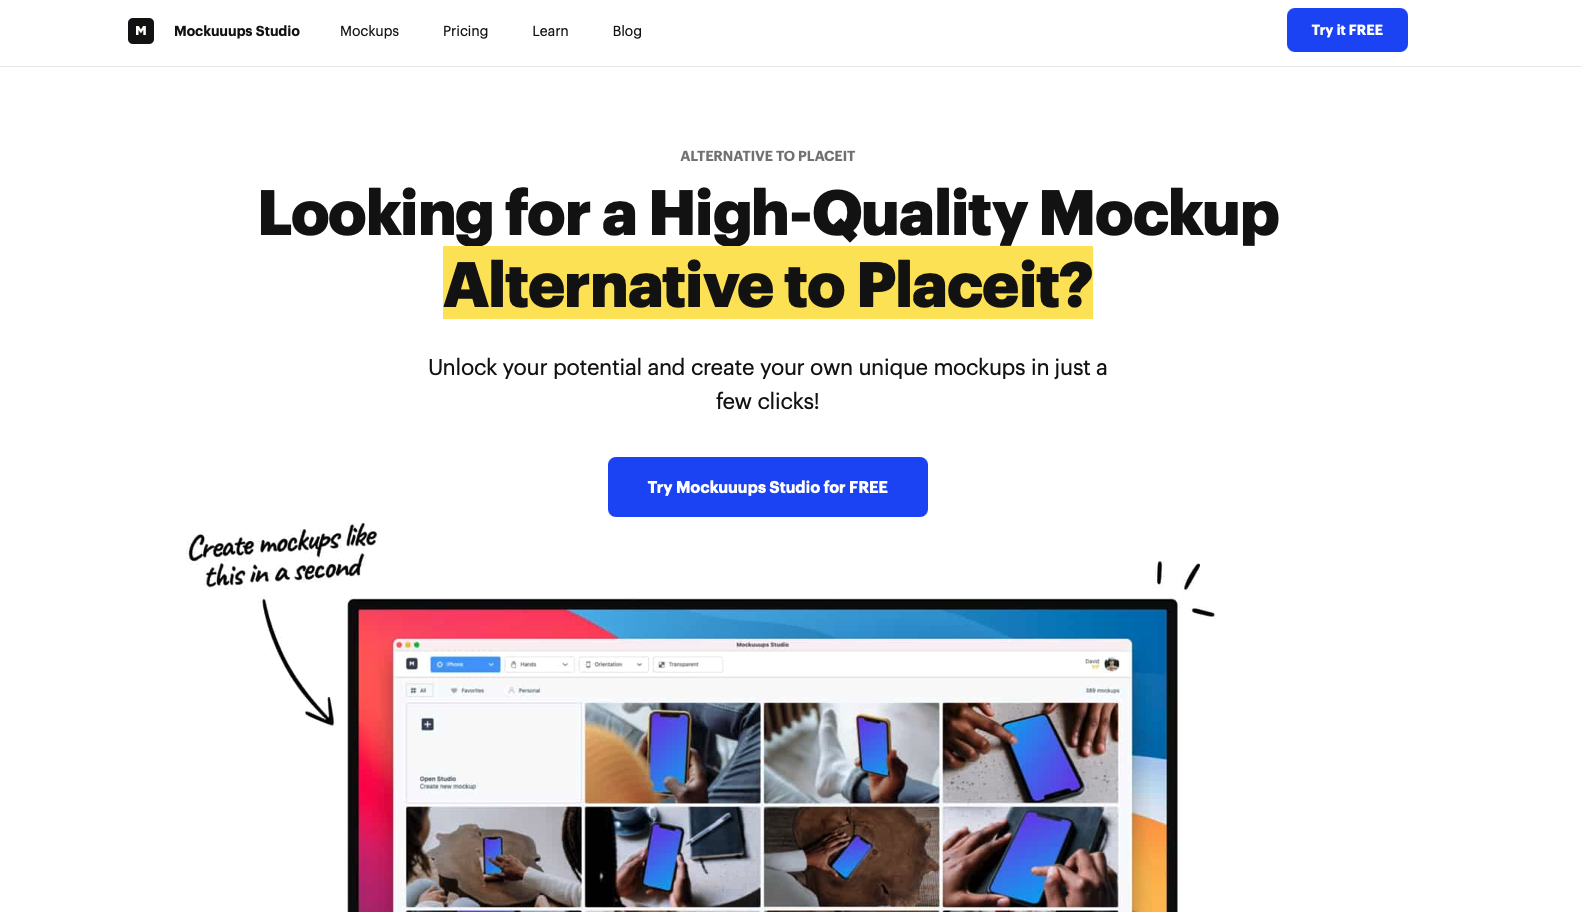 Mockuuups studio's perfect alternative page